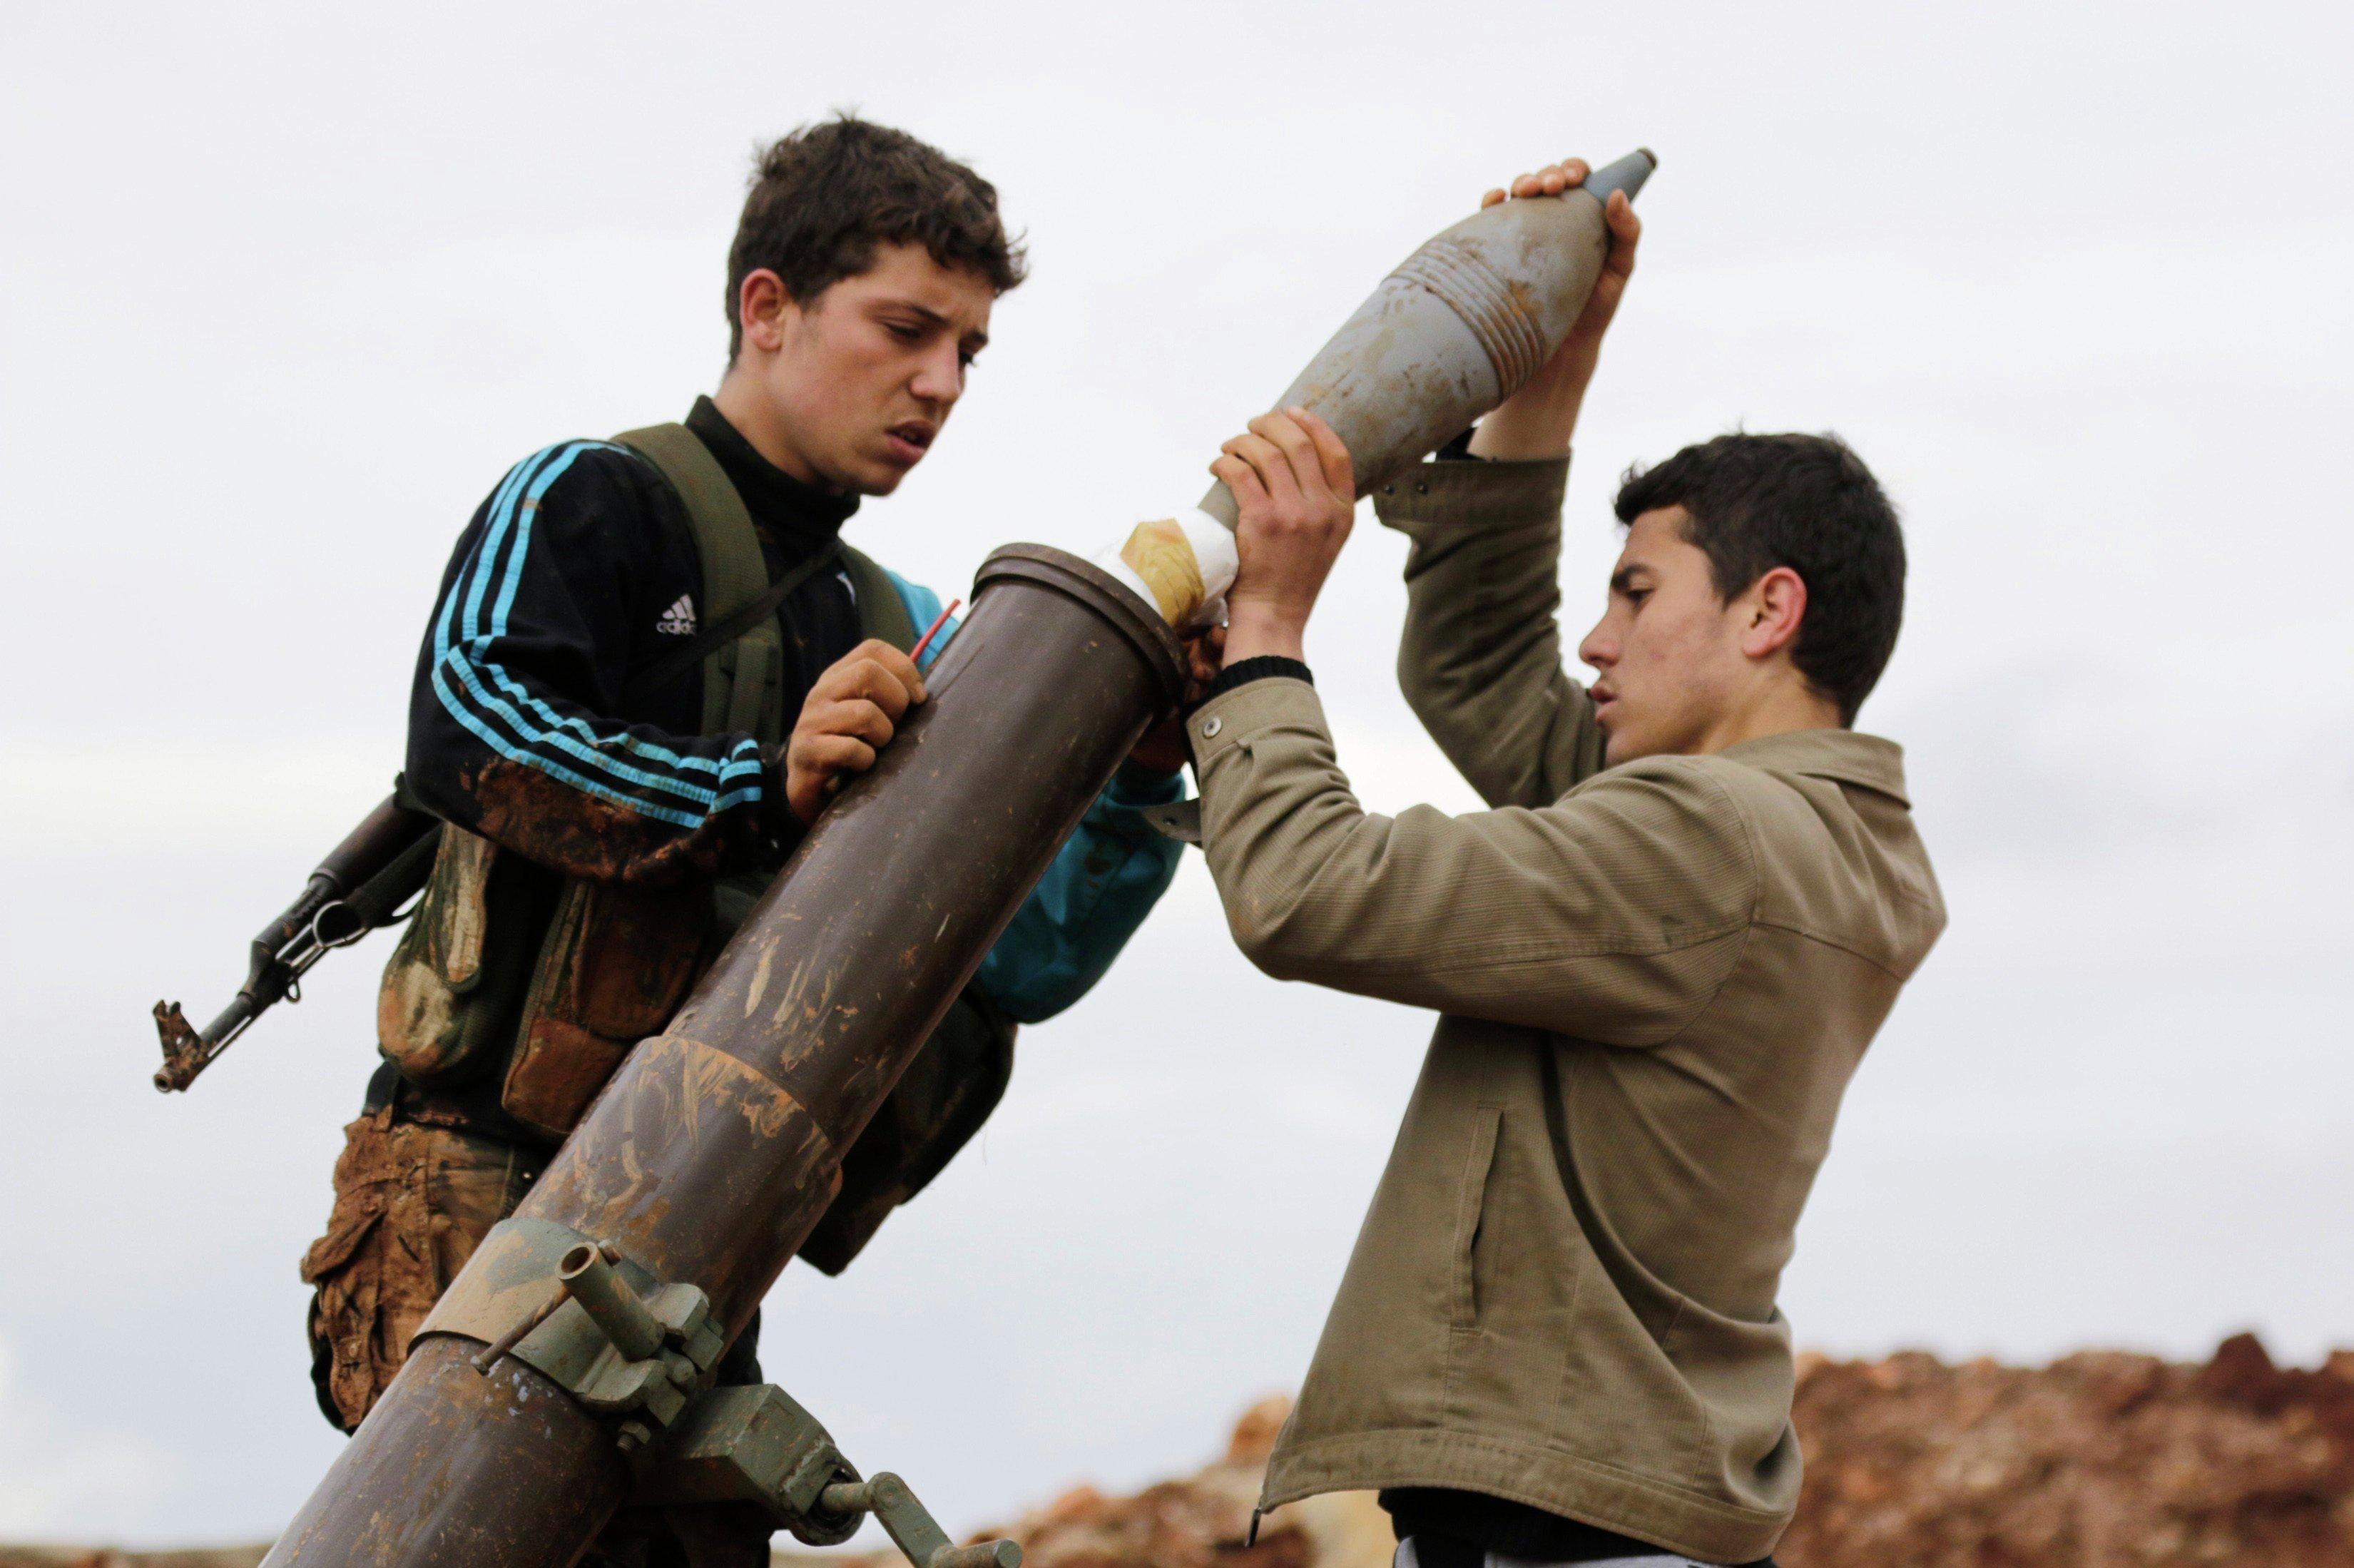 Members of al Qaeda's Nusra Front prepare to fire a mortar towards forces loyal to Syria's President Bashar al-Assad in al-Mallah farms, north of Aleppo, February 18, 2015